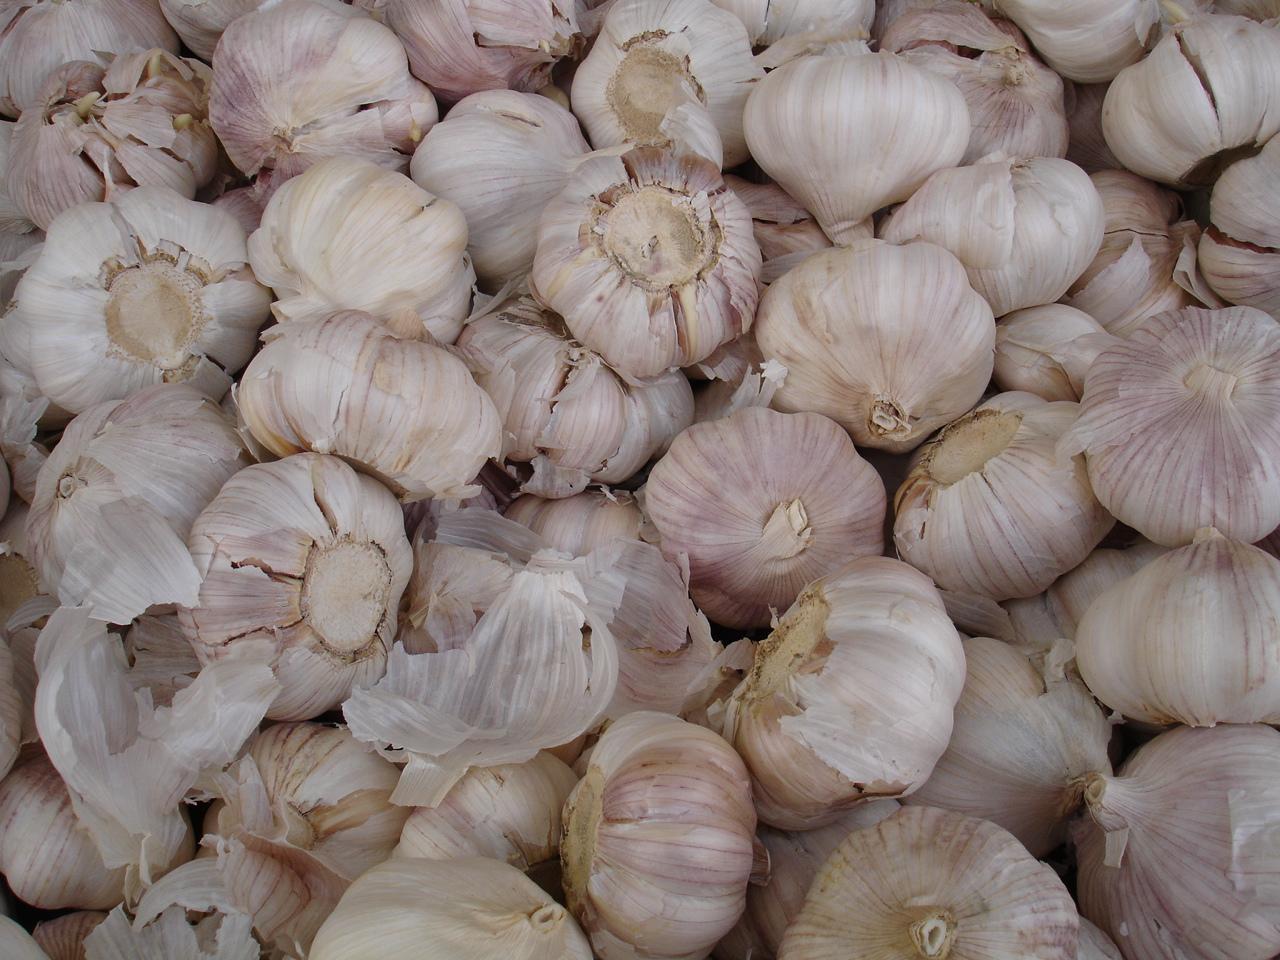 garlic-1183051